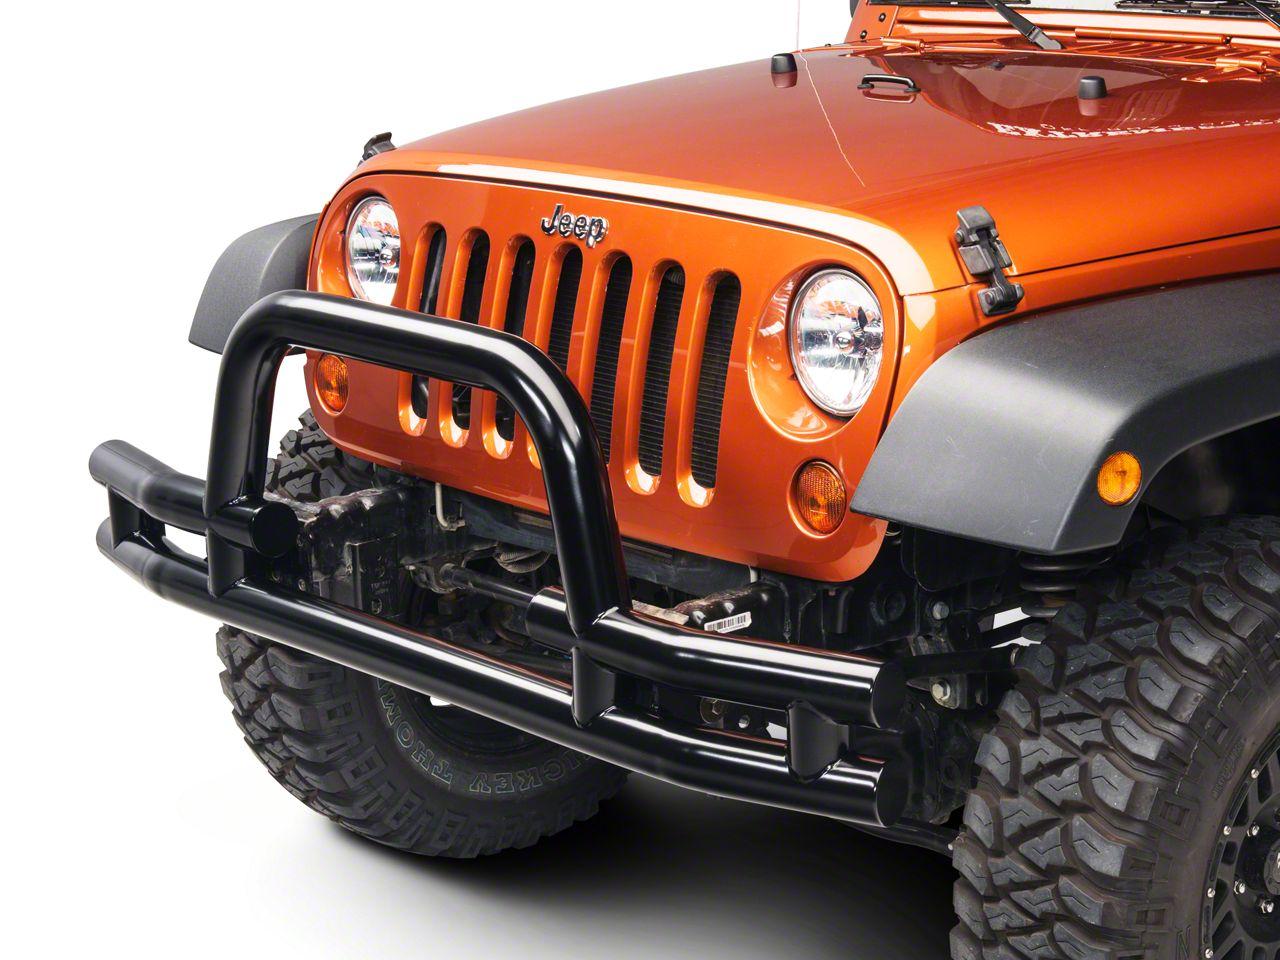 Barricade Tubular Front Bumper w/ Winch Cutout - Gloss Black (07-18 Jeep Wrangler JK)